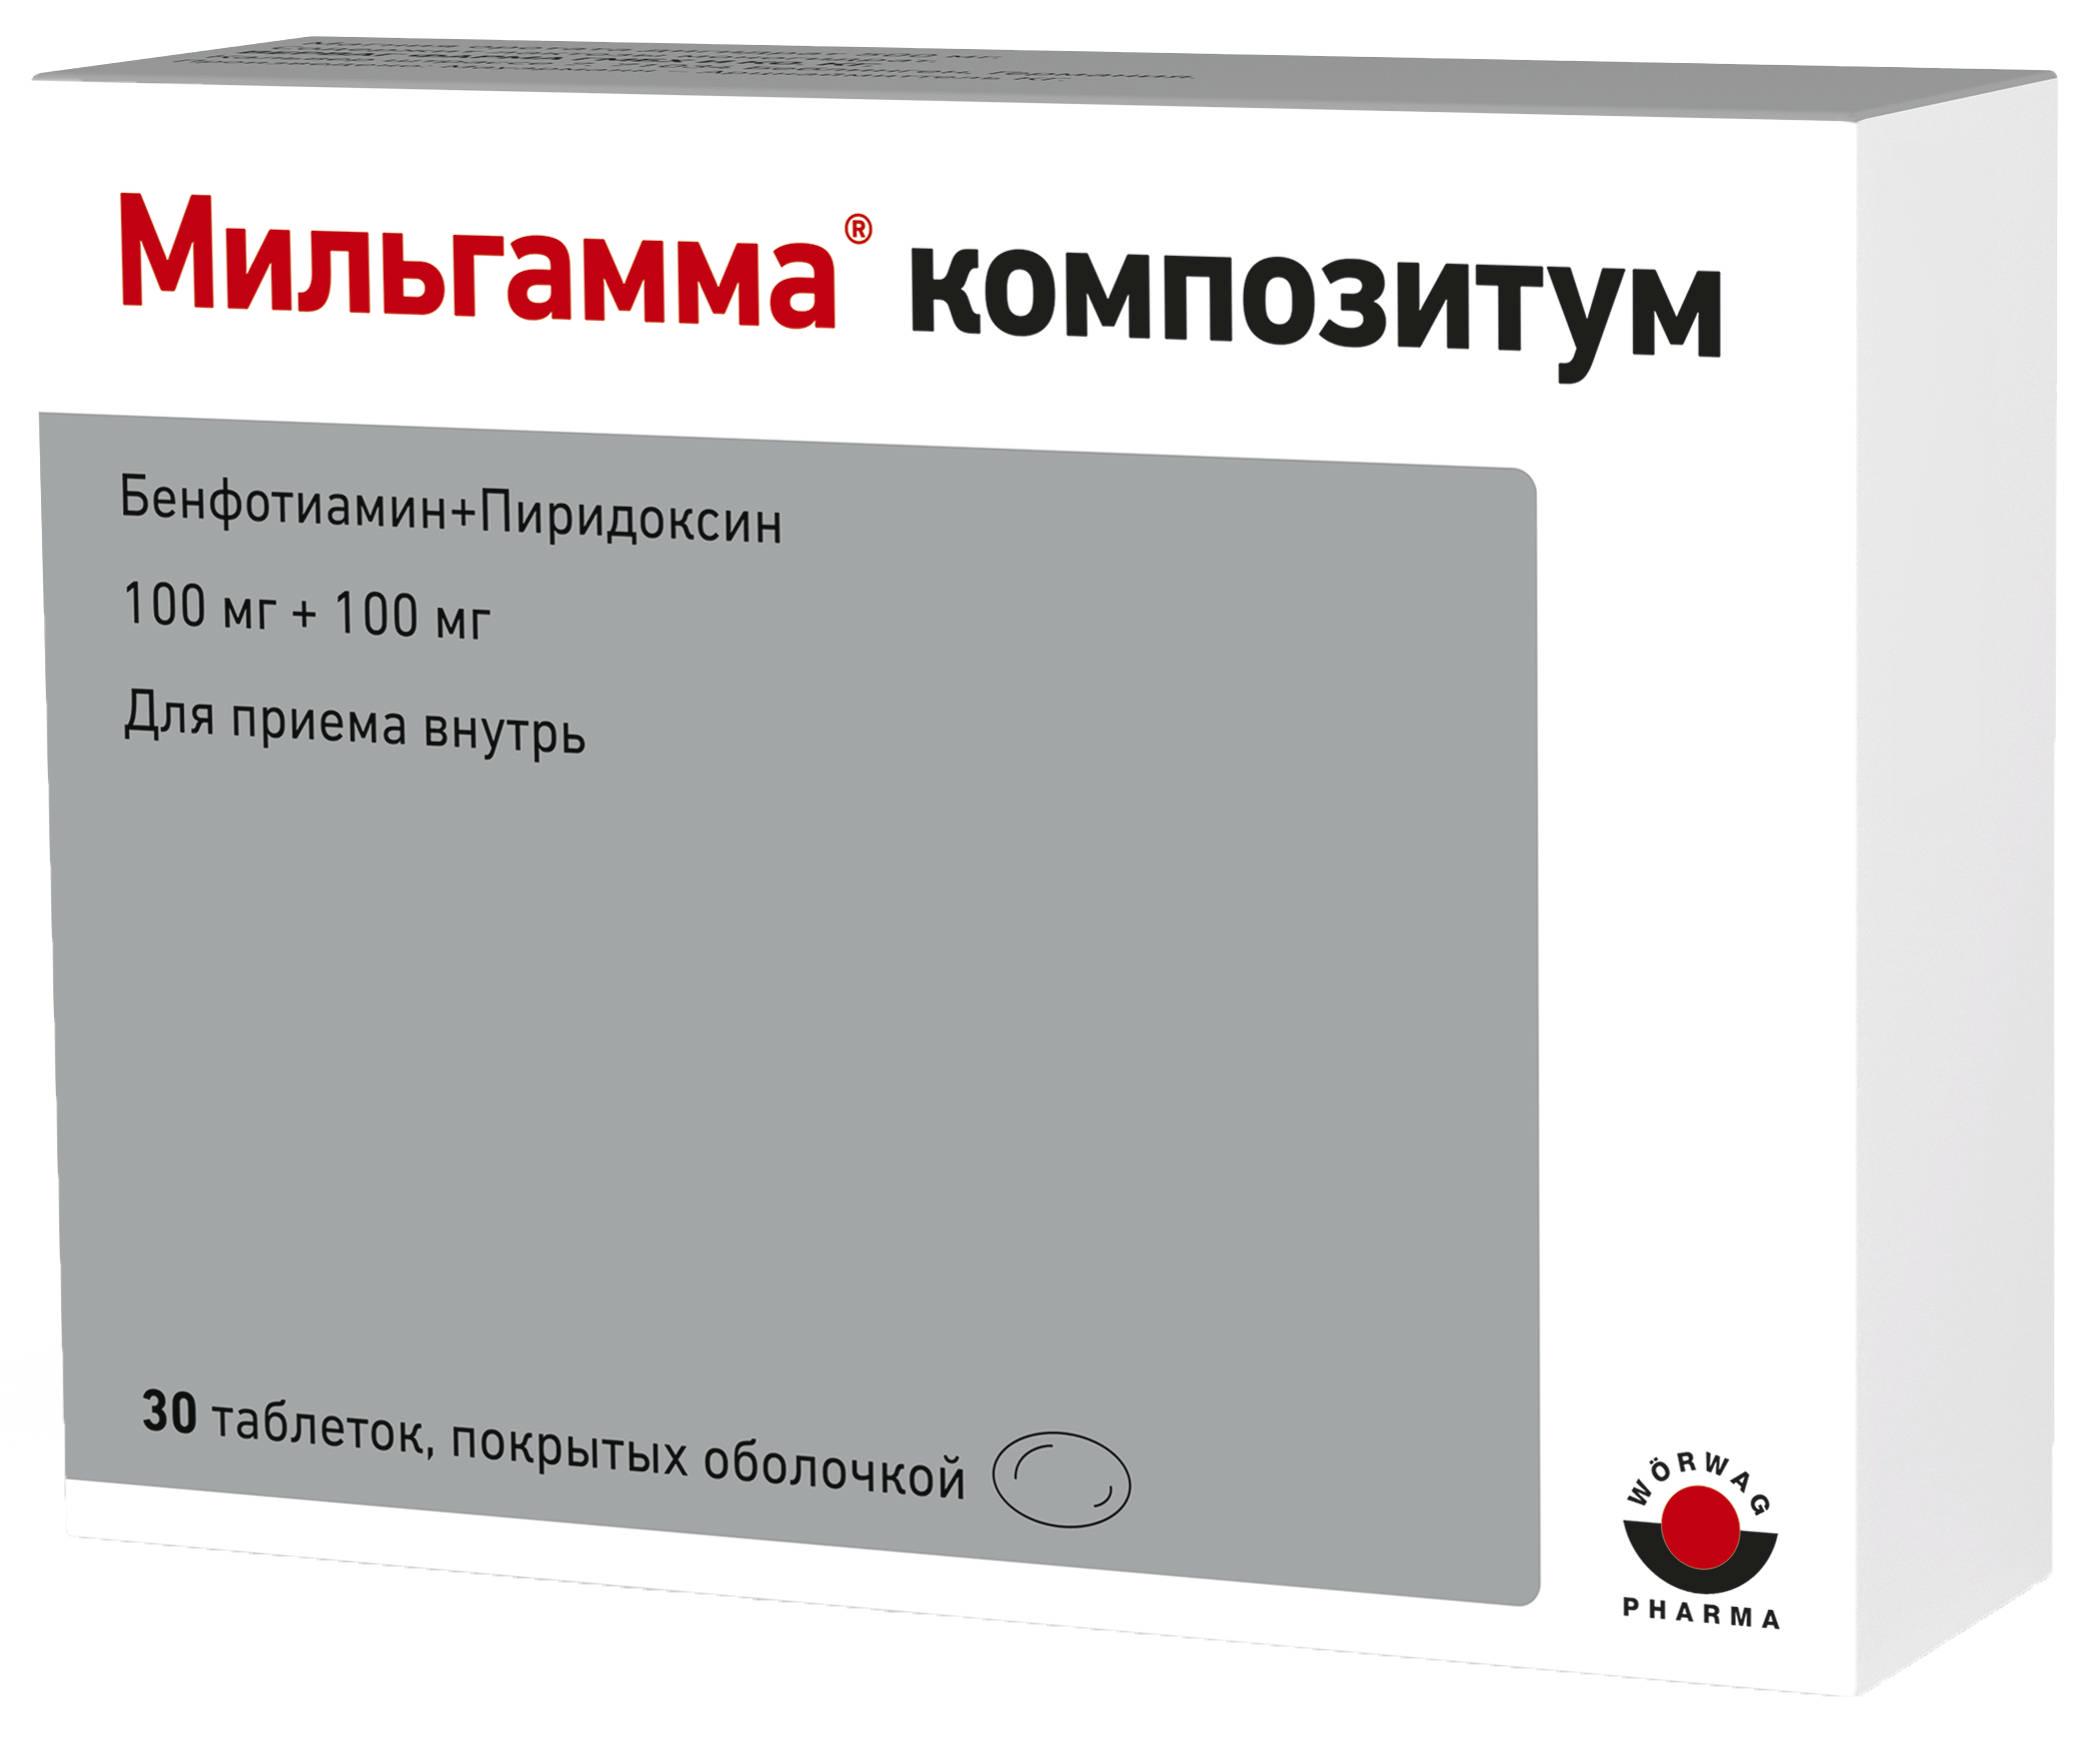 МИЛЬГАММА КОМПОЗИТУМ таблетки 100 мг+100 мг 30 шт.